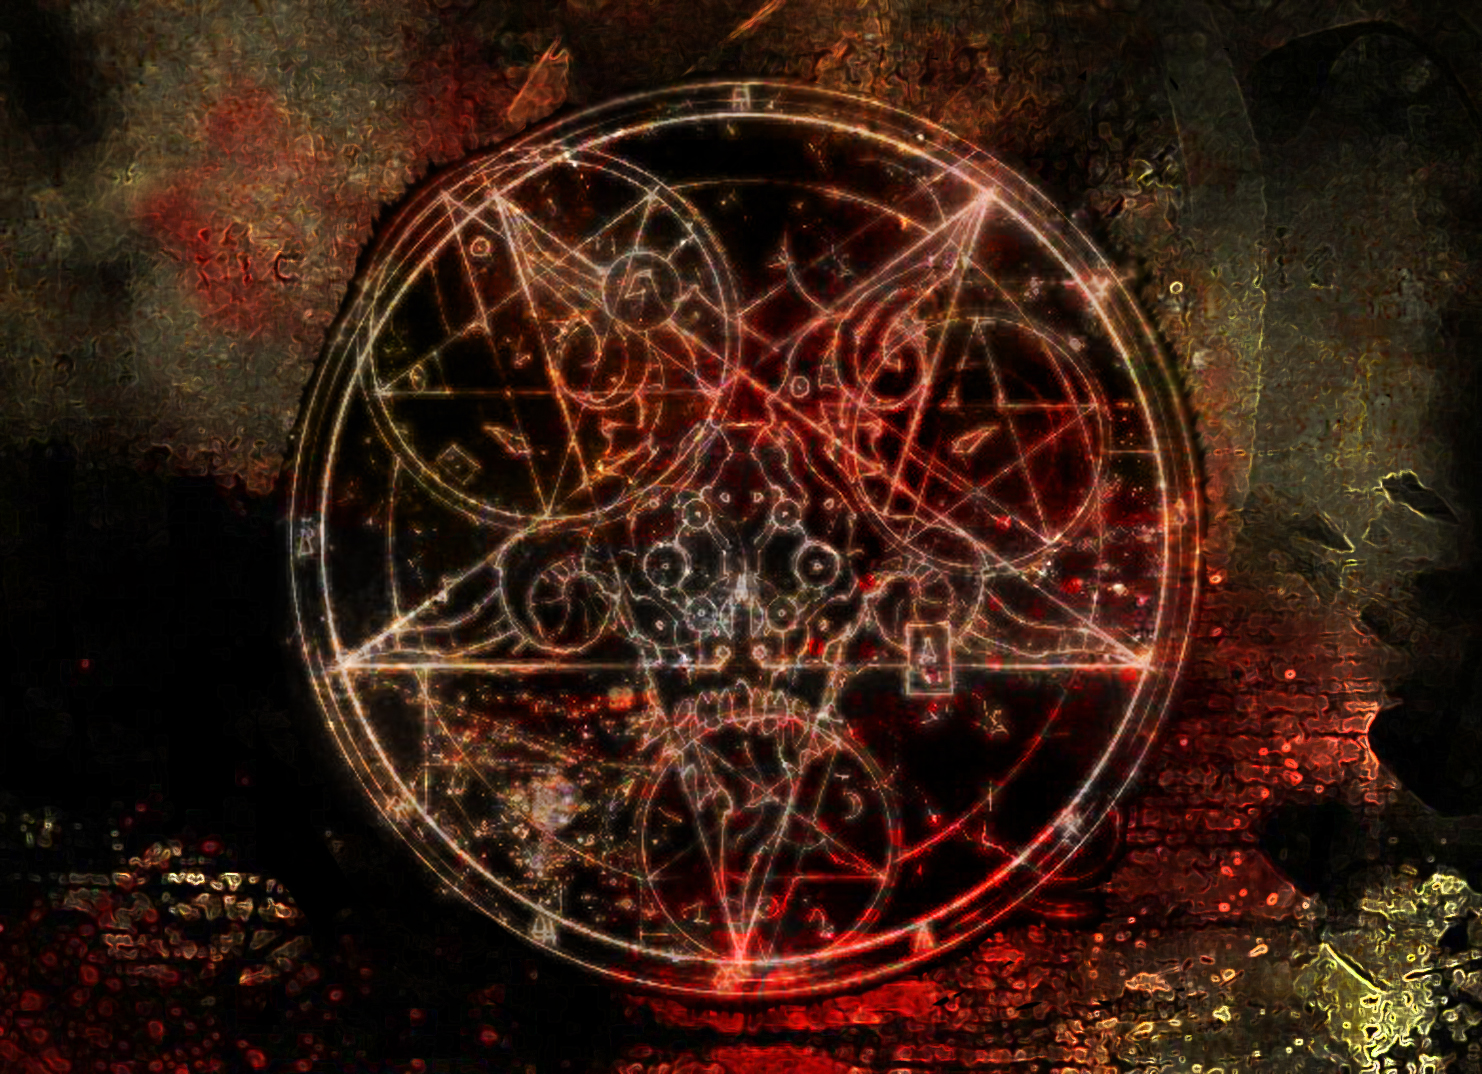 Space Demonic Art Hd Wallpaper: SomeOrdinaryGamers Wiki